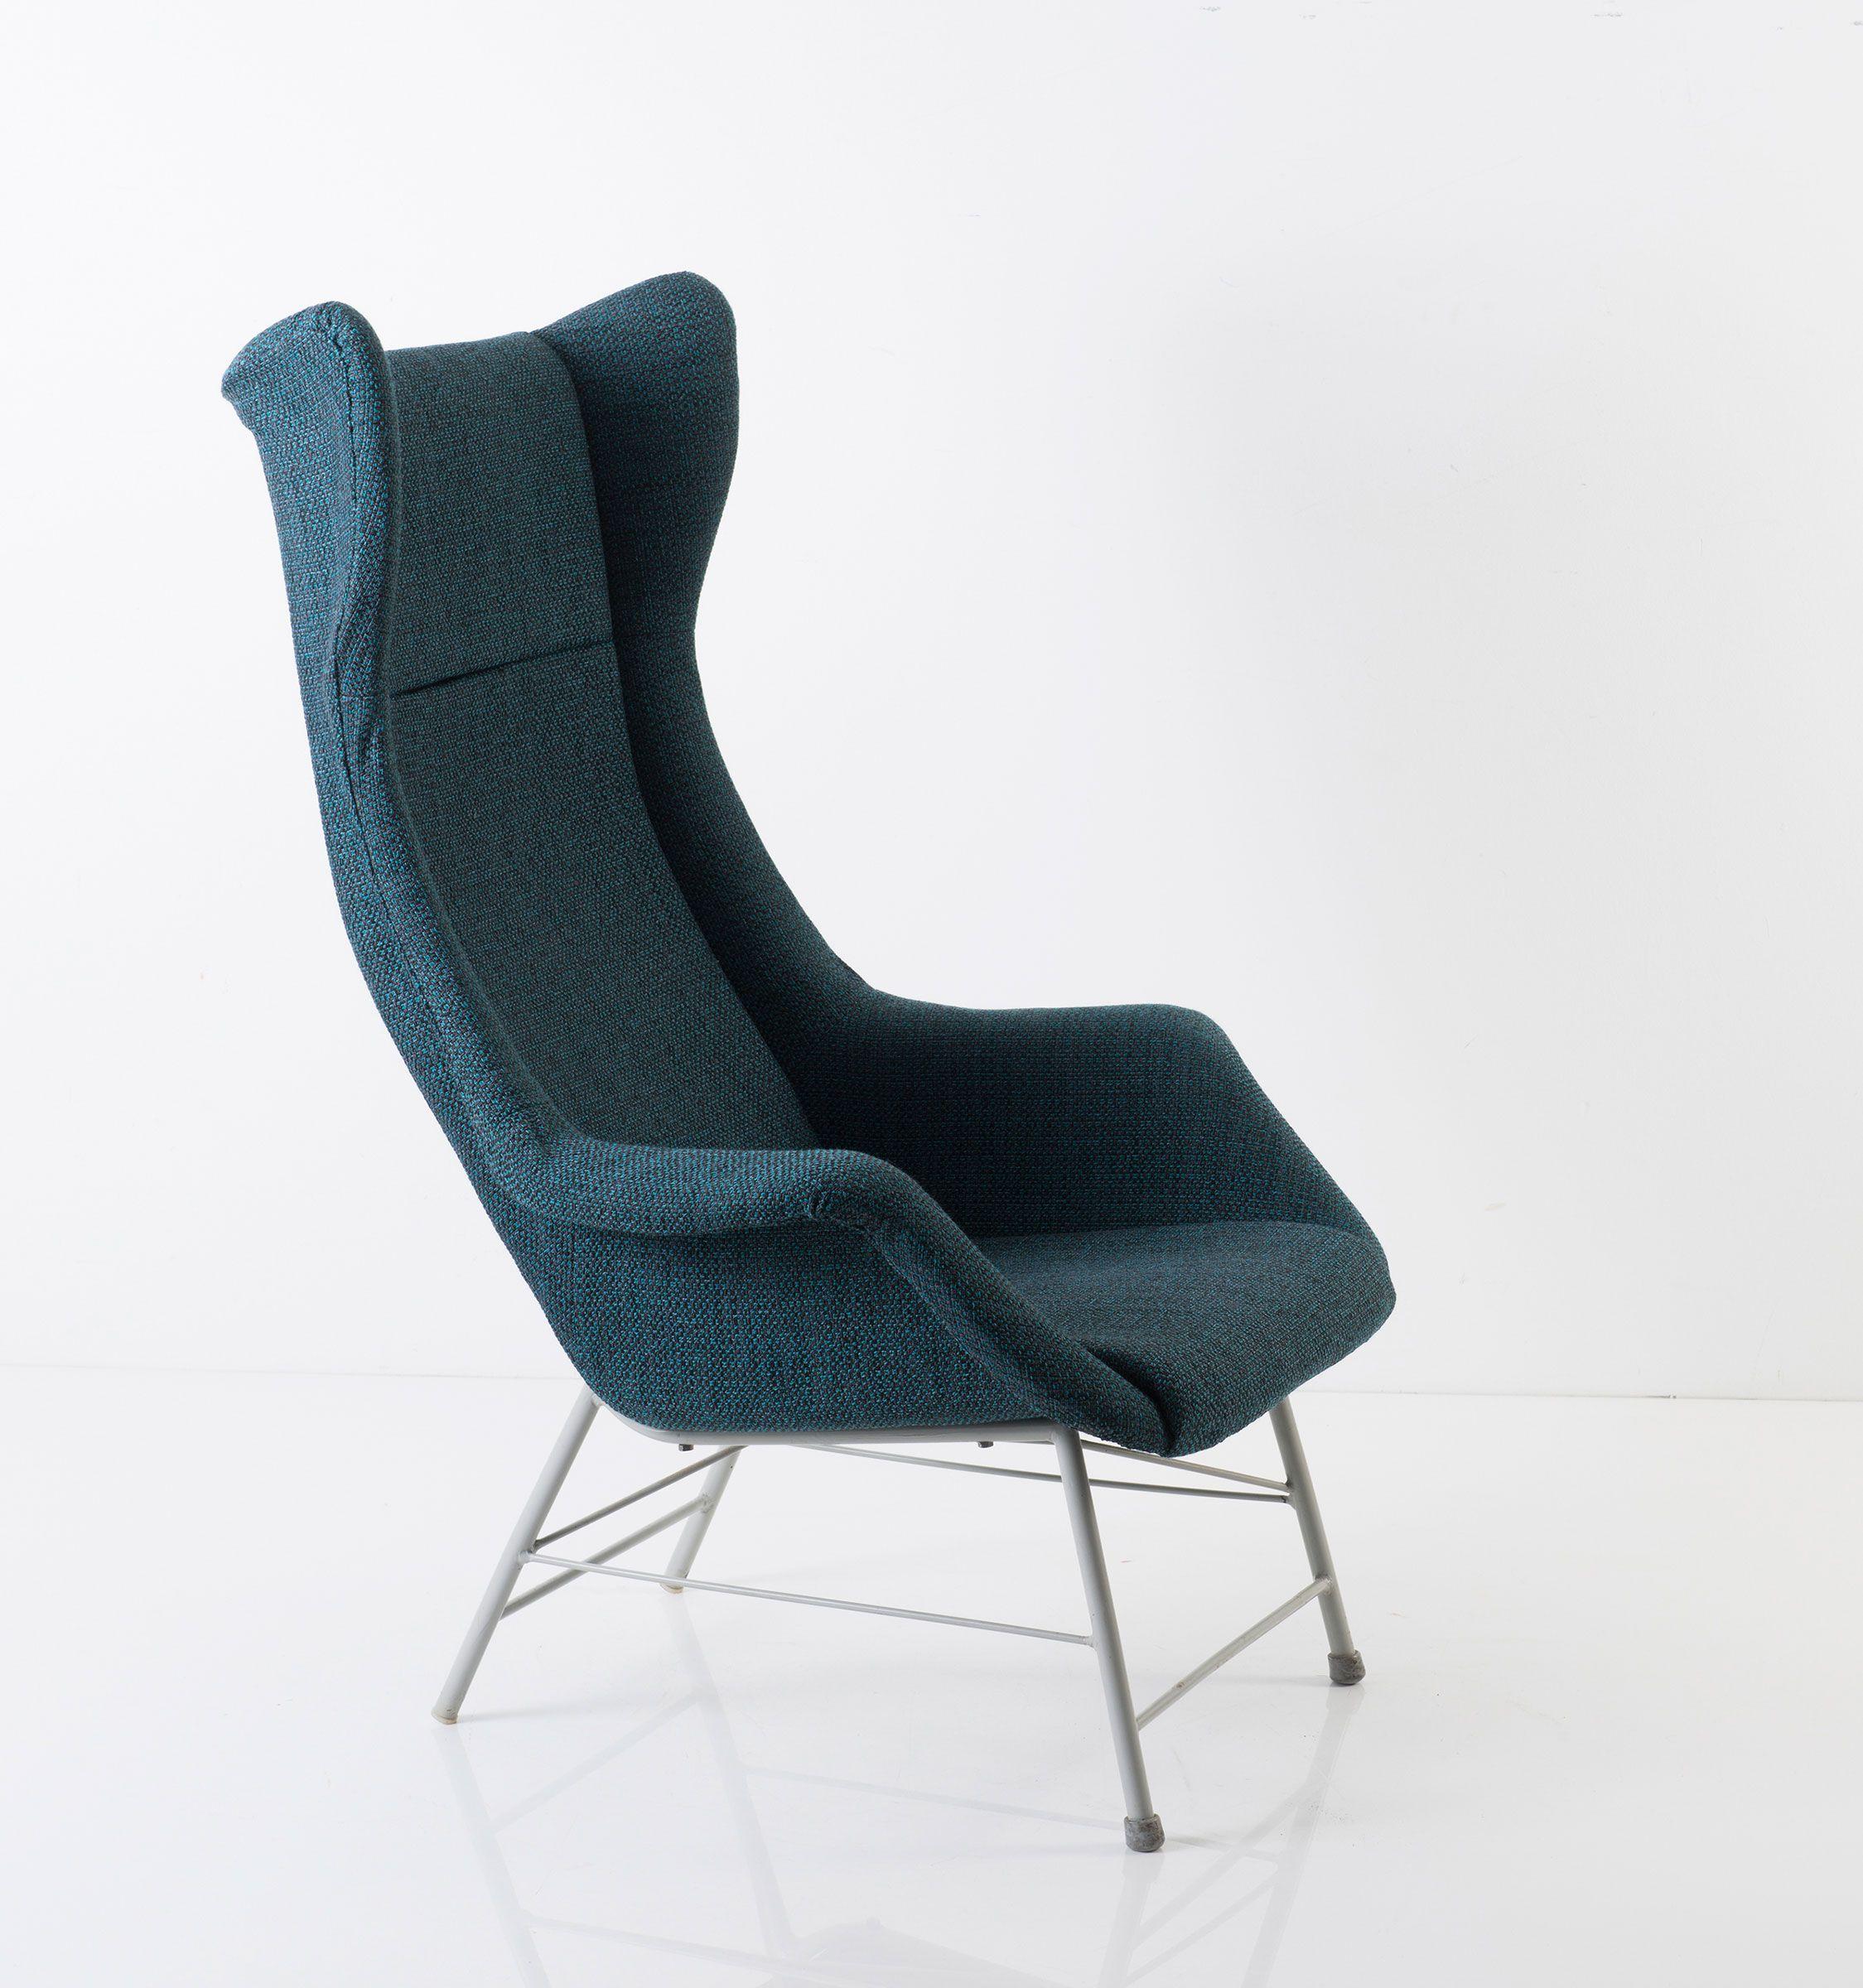 Miroslav Navrátil Enameled Metal Lounge Chair for Ton c1965